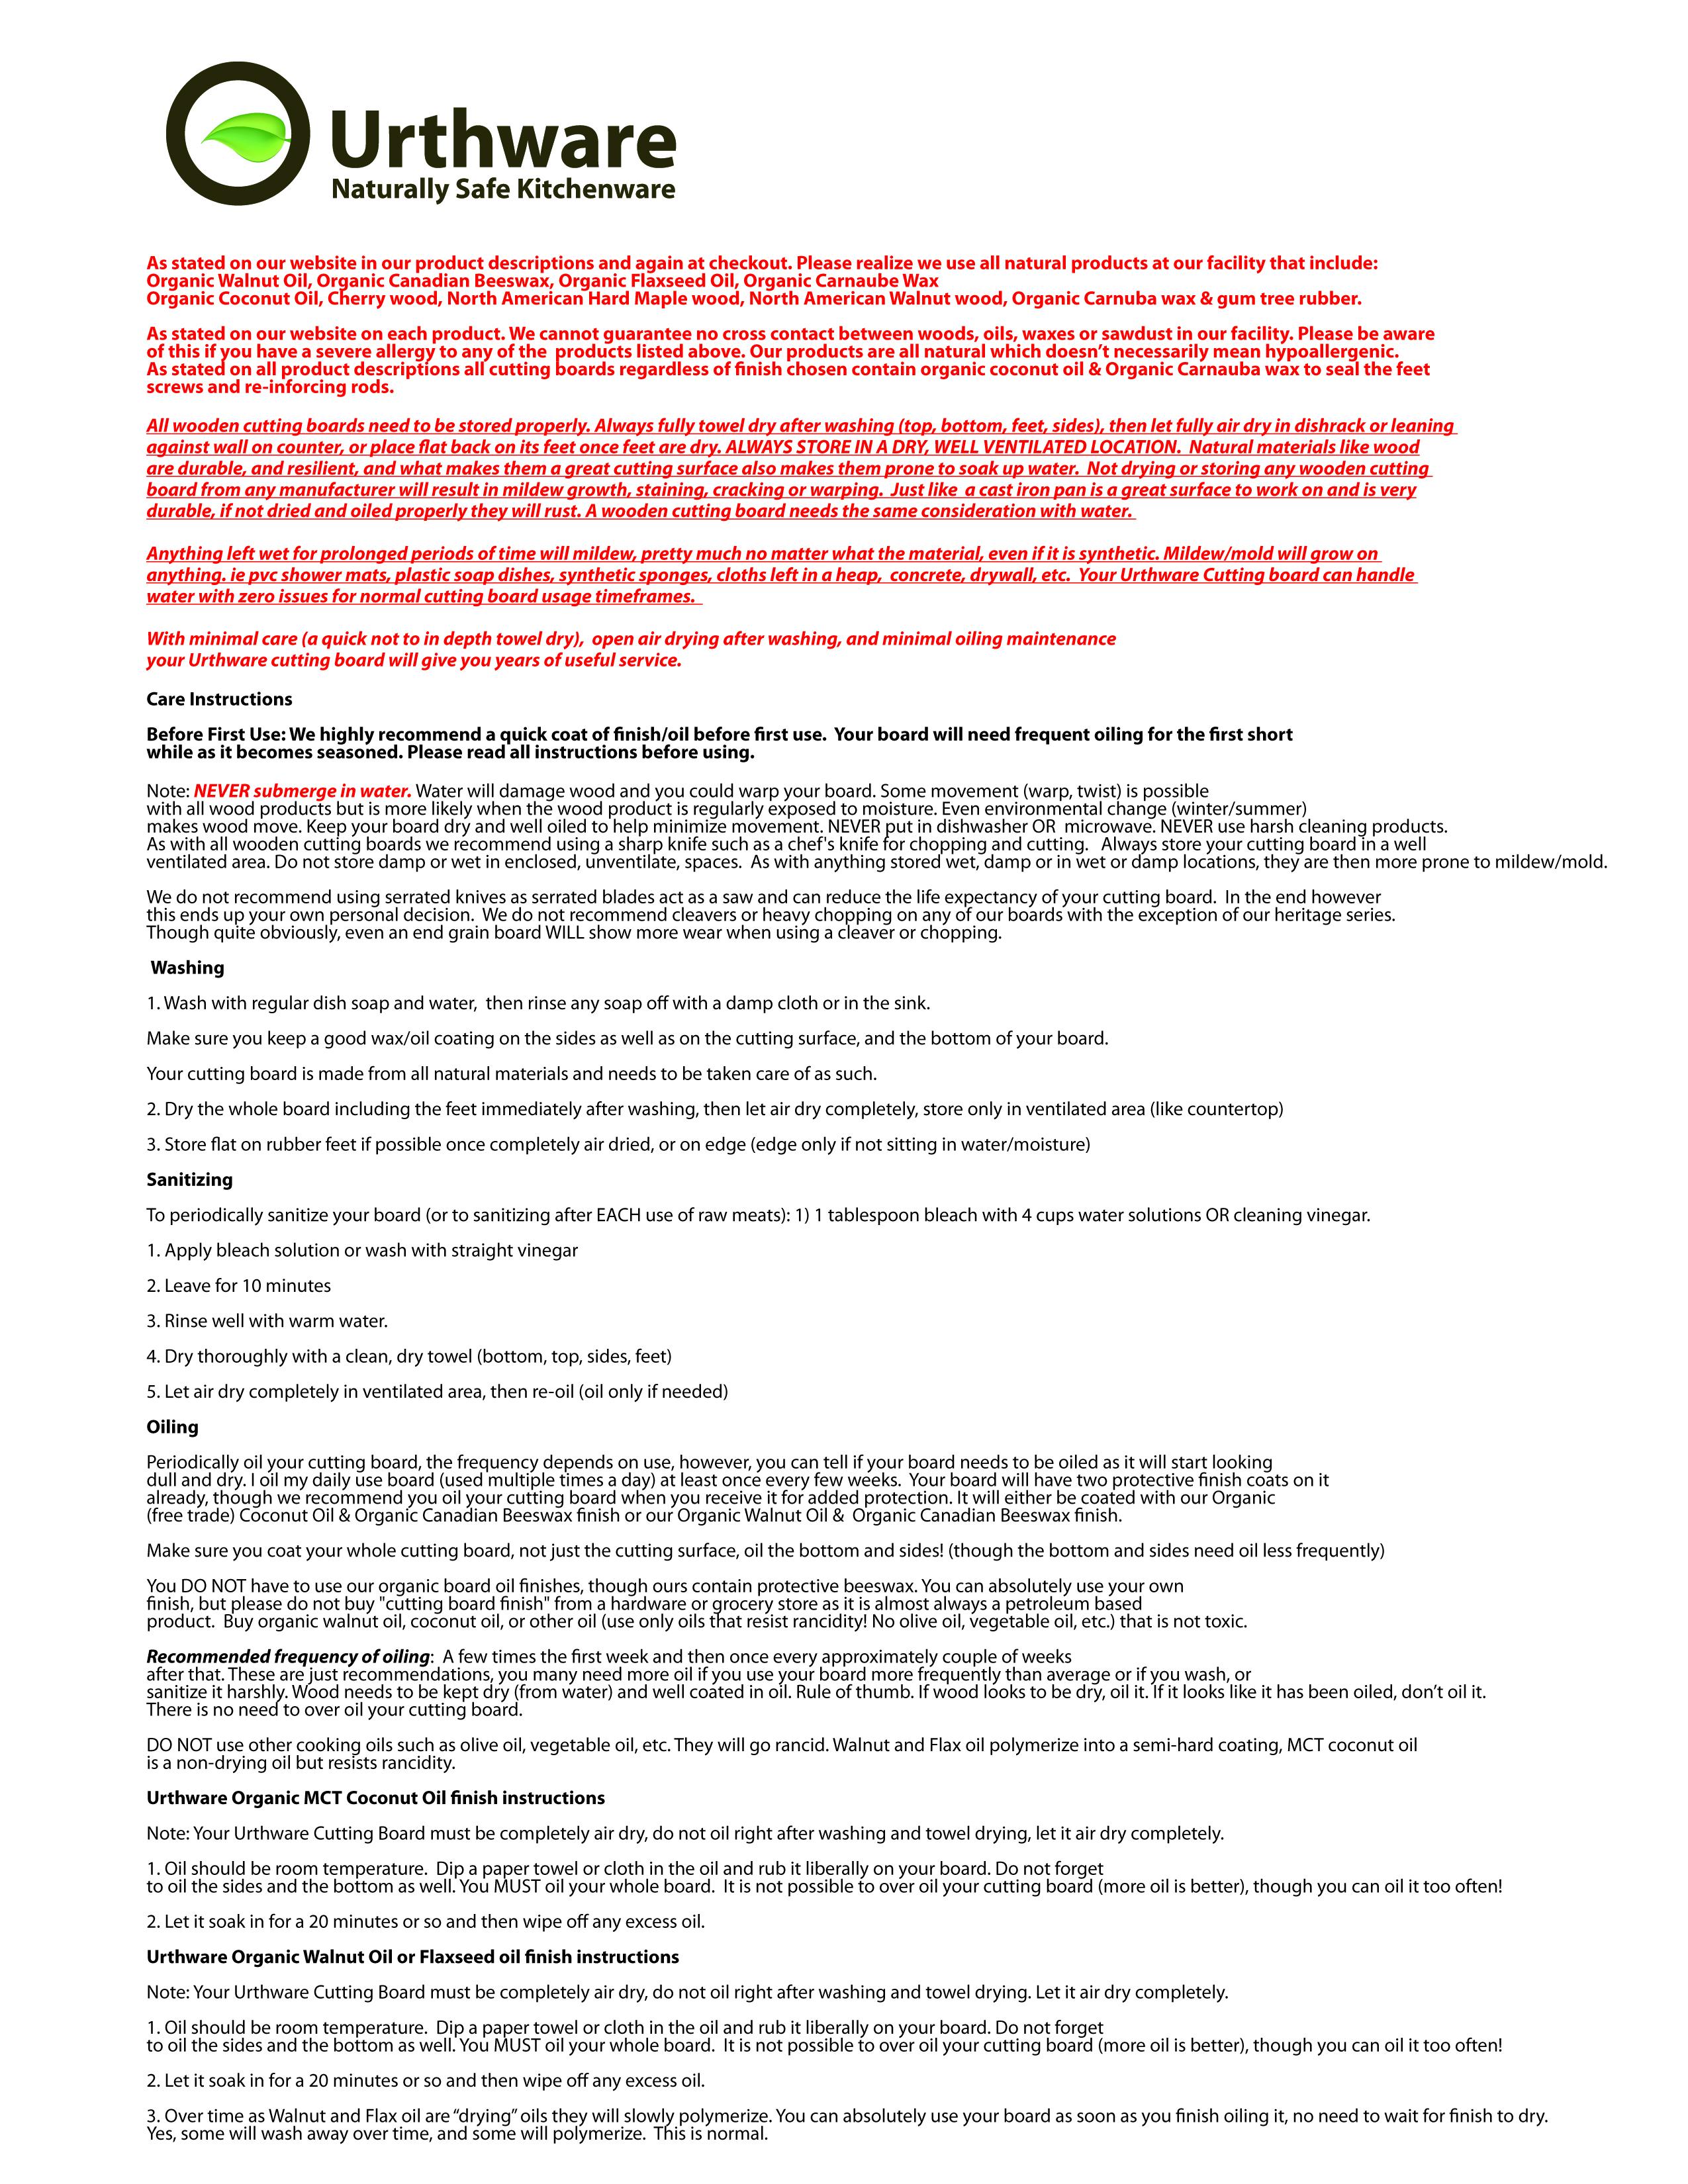 urthware-care-instructions-2019-web.jpg